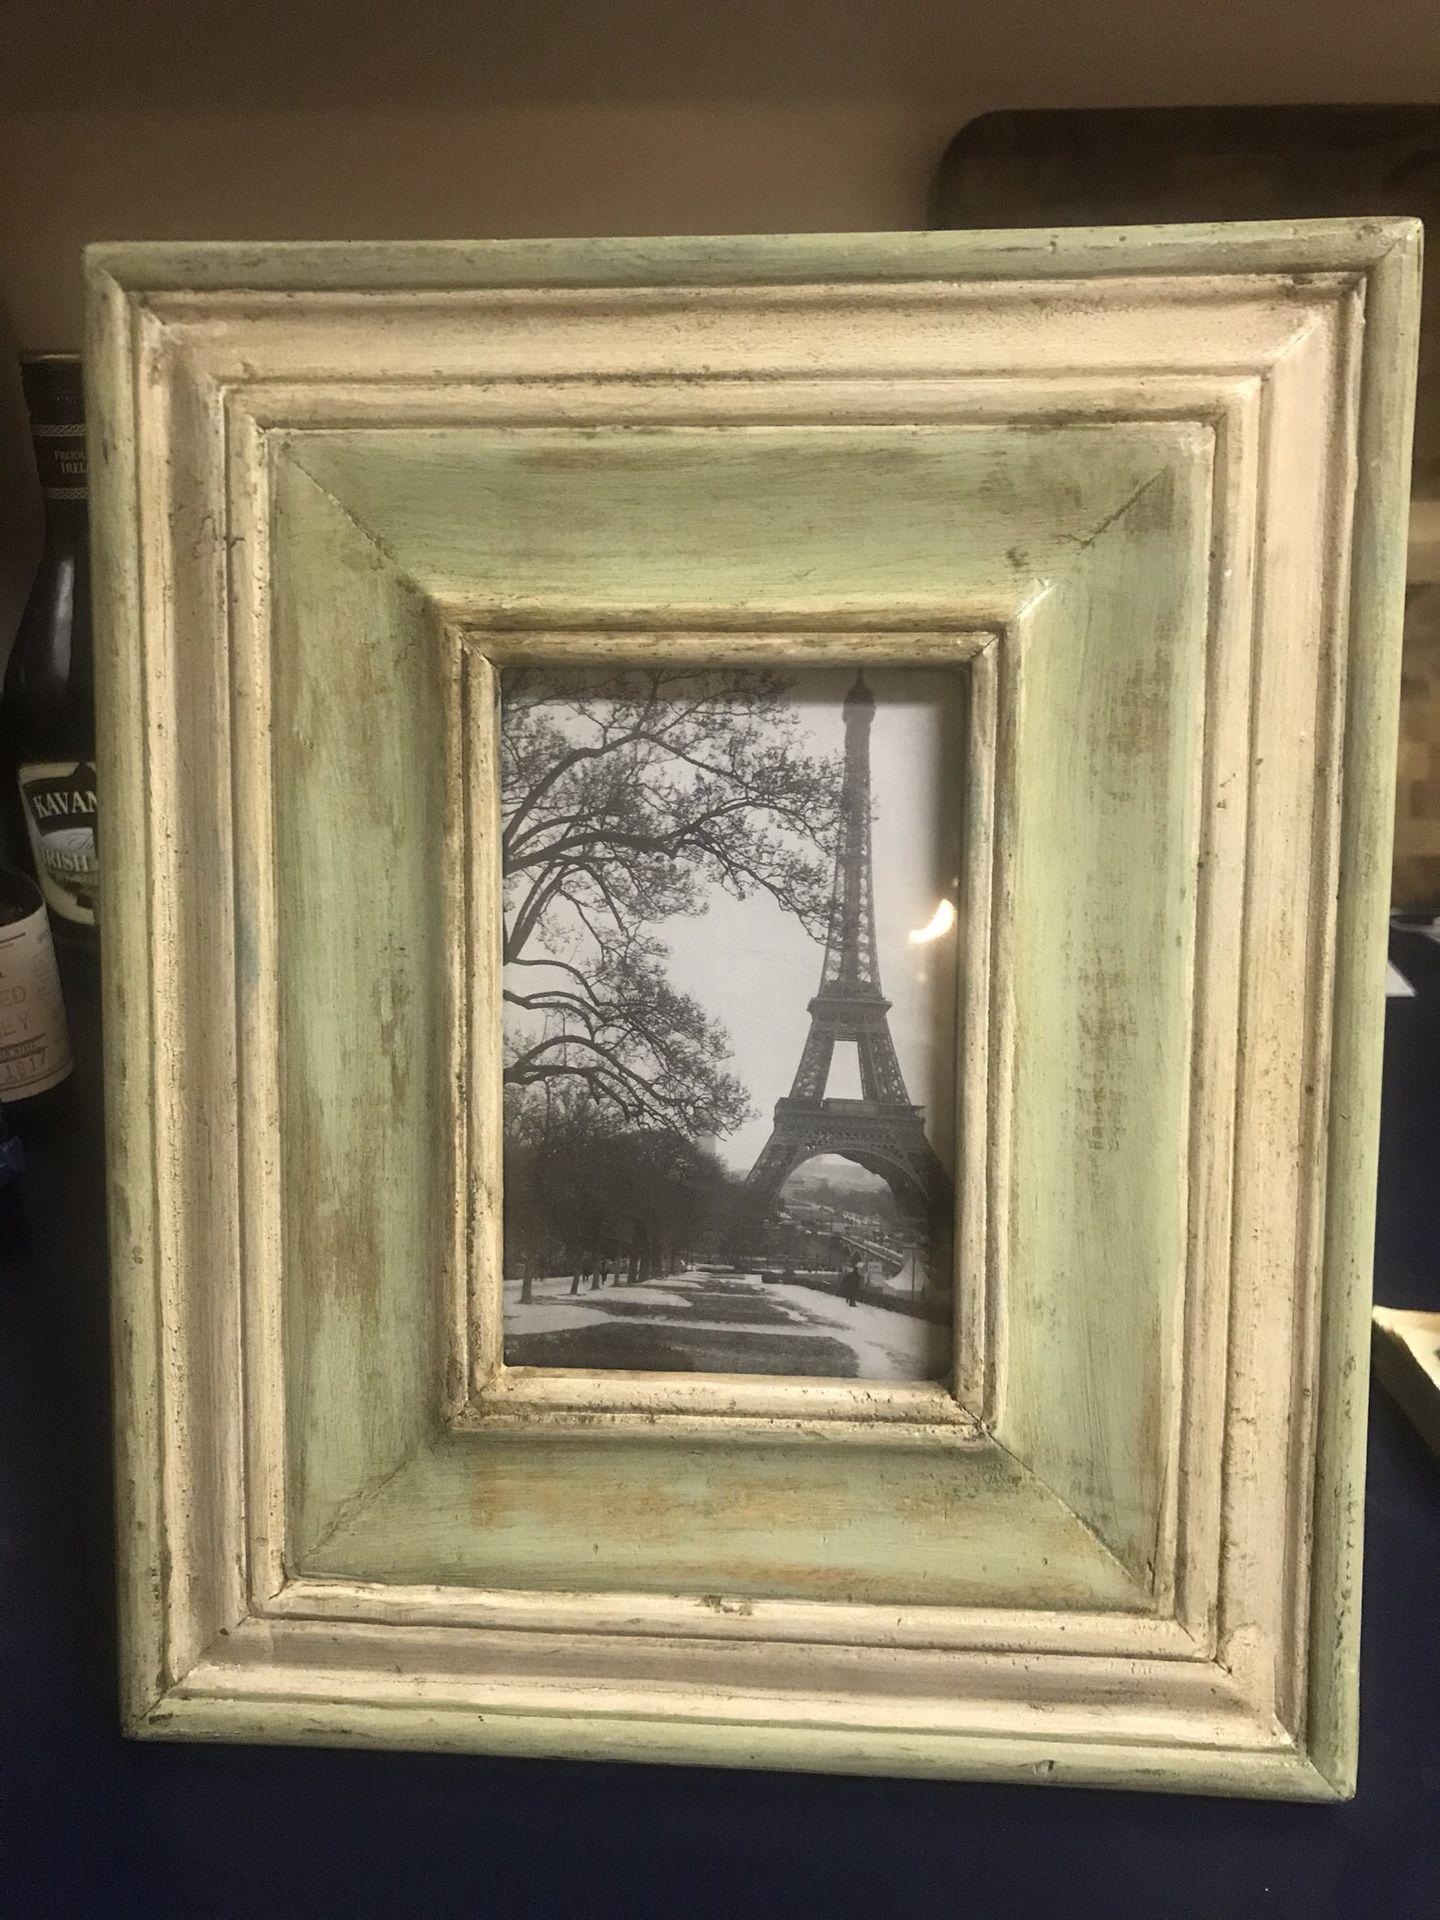 World market 4x6 frames